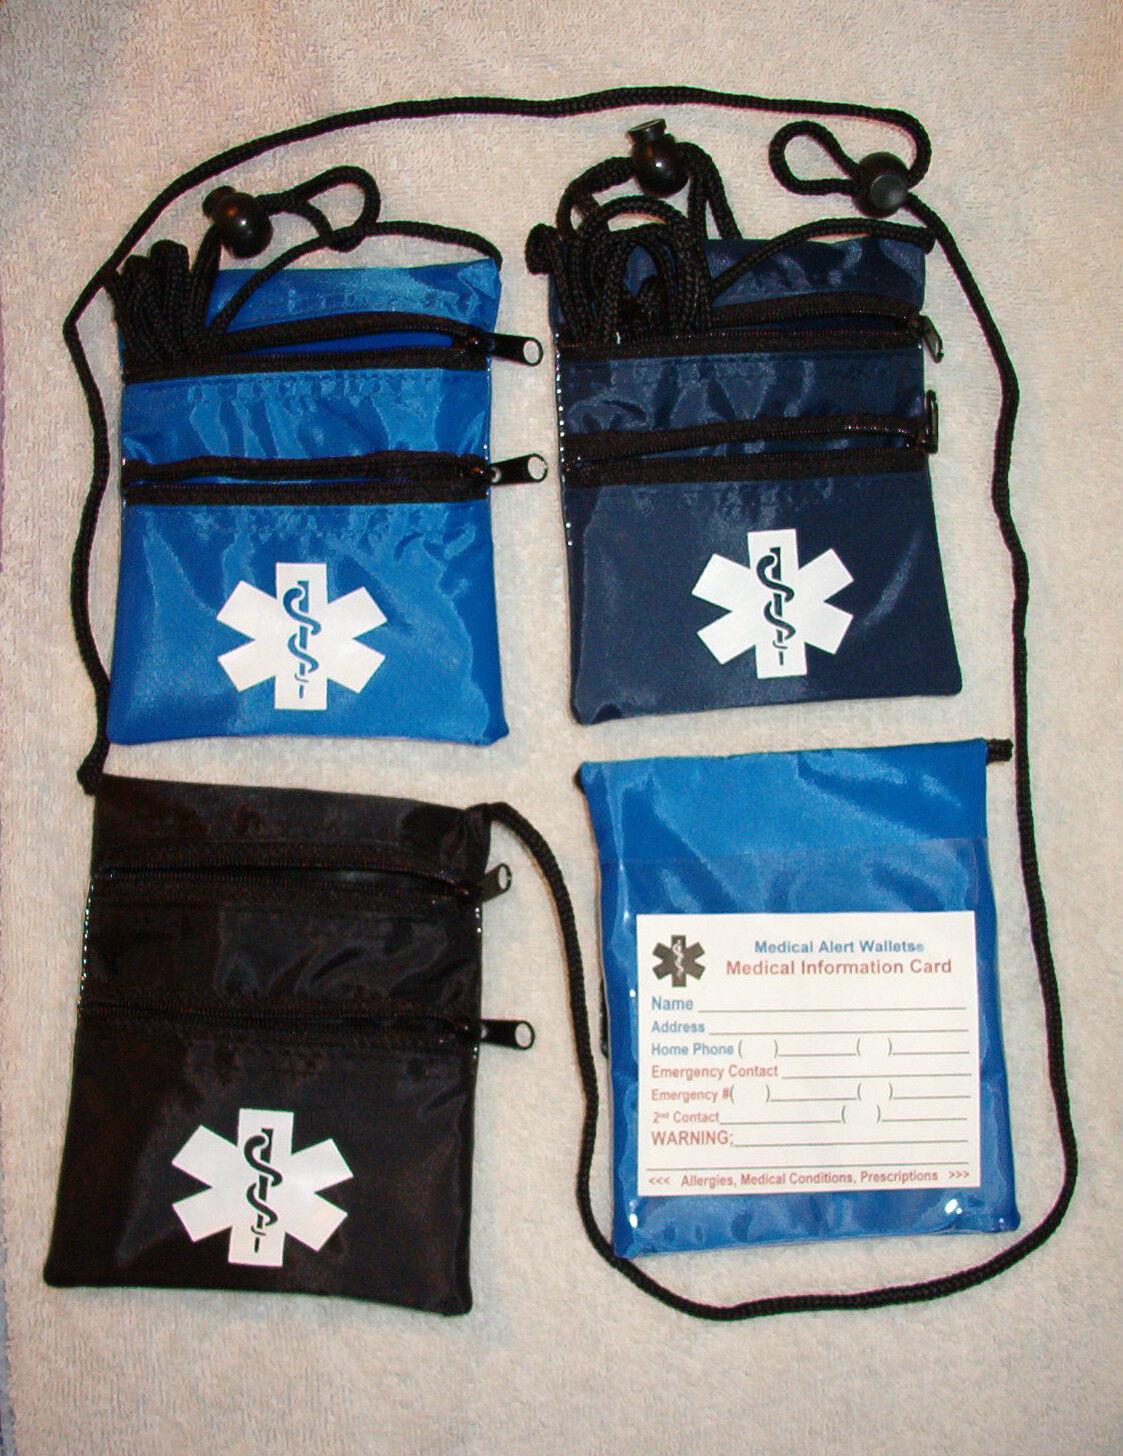 2 Zippers Nylon Neck Medical Wallets w/ med symbol, colors Black, Navy & Royal